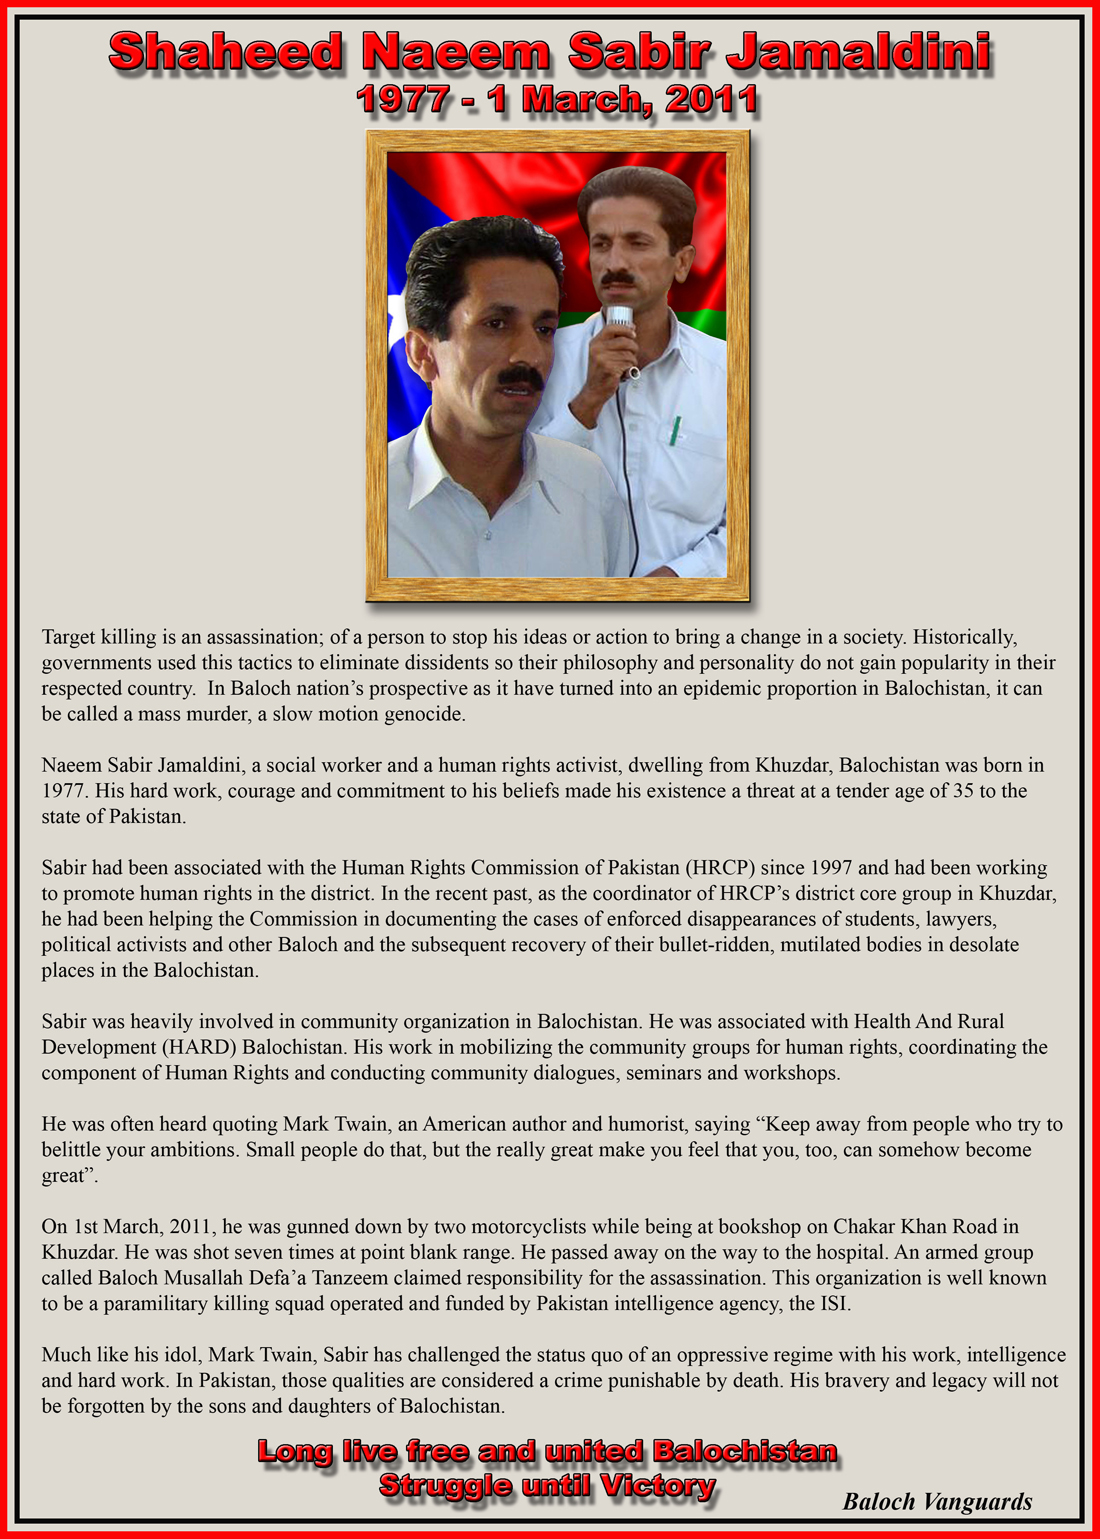 http://baluchsarmachar.files.wordpress.com/2012/02/1shaheed-naeem-sabir-jamaldini.jpg